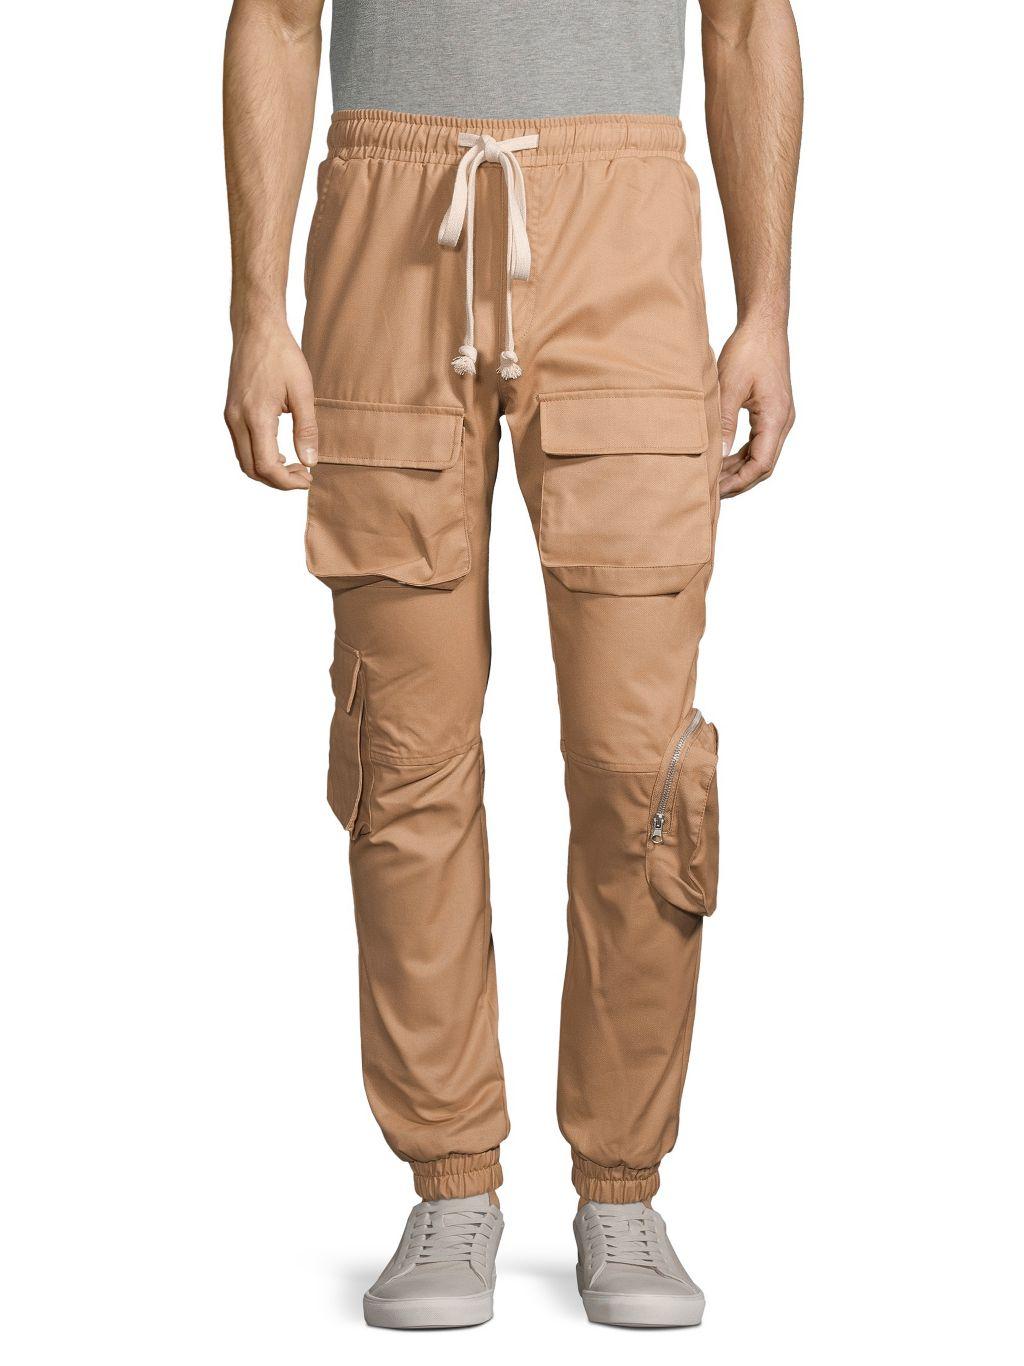 American Stitch Drawstring Cargo Pants